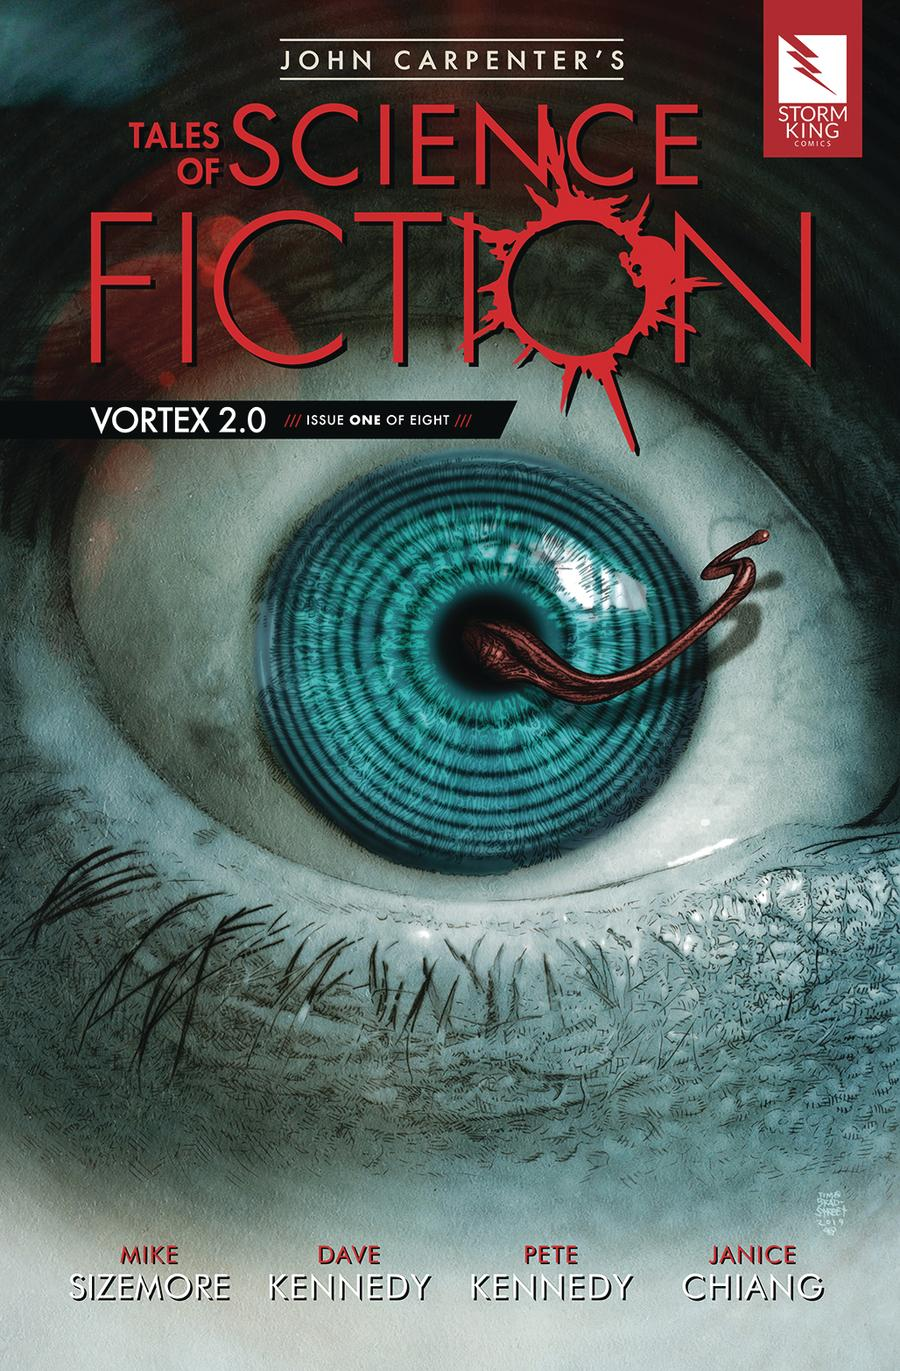 John Carpenters Tales Of Science Fiction Vortex 2.0 #1